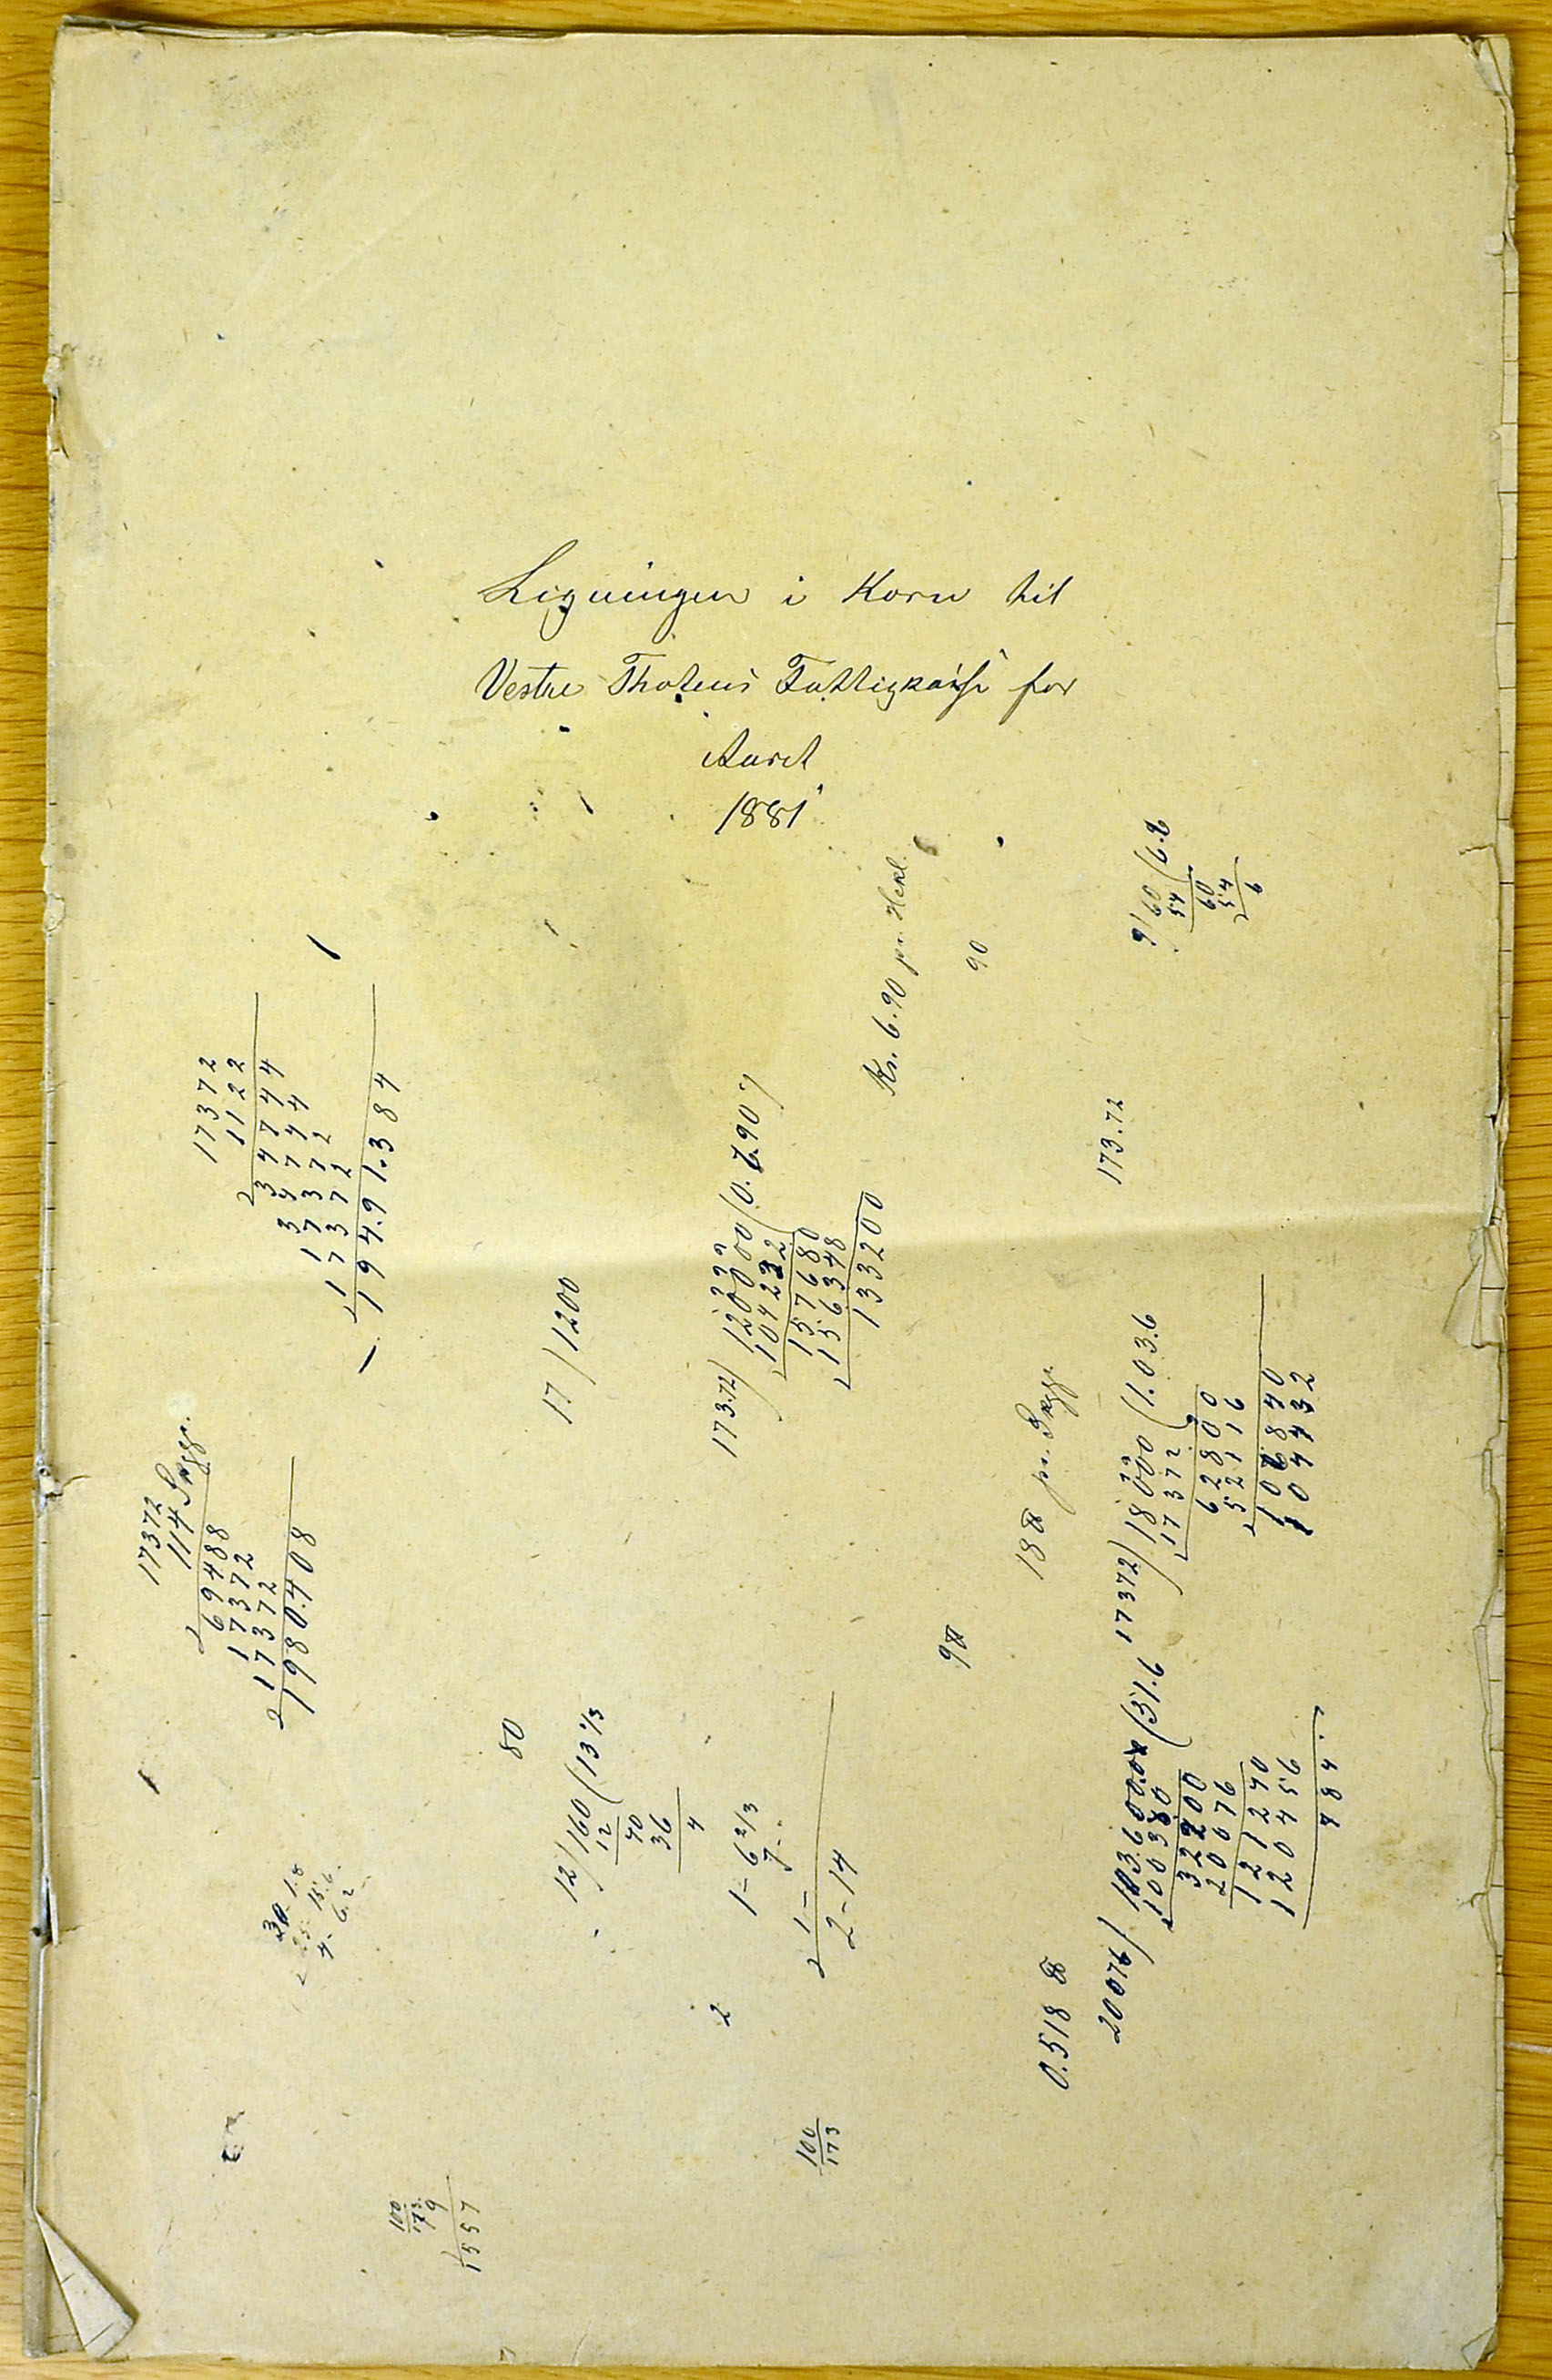 KVT, Vestre Toten kommunearkiv*, -: Ligningen i korn til Vestre Totens fattigkasse, 1881